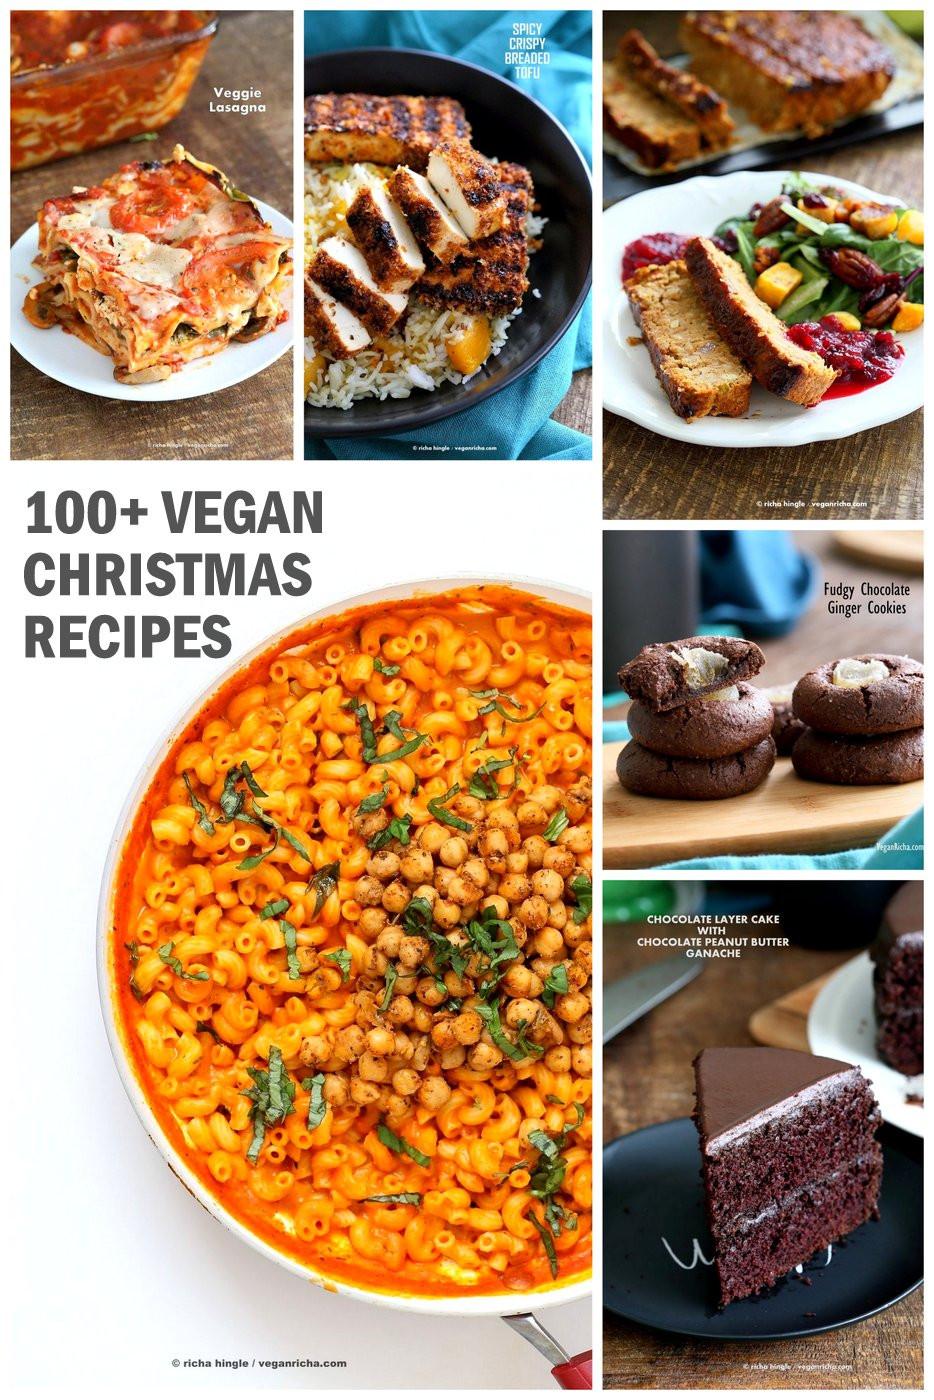 Vegan Christmas Recipes  100 Vegan Christmas Recipes Glutenfree options Vegan Richa